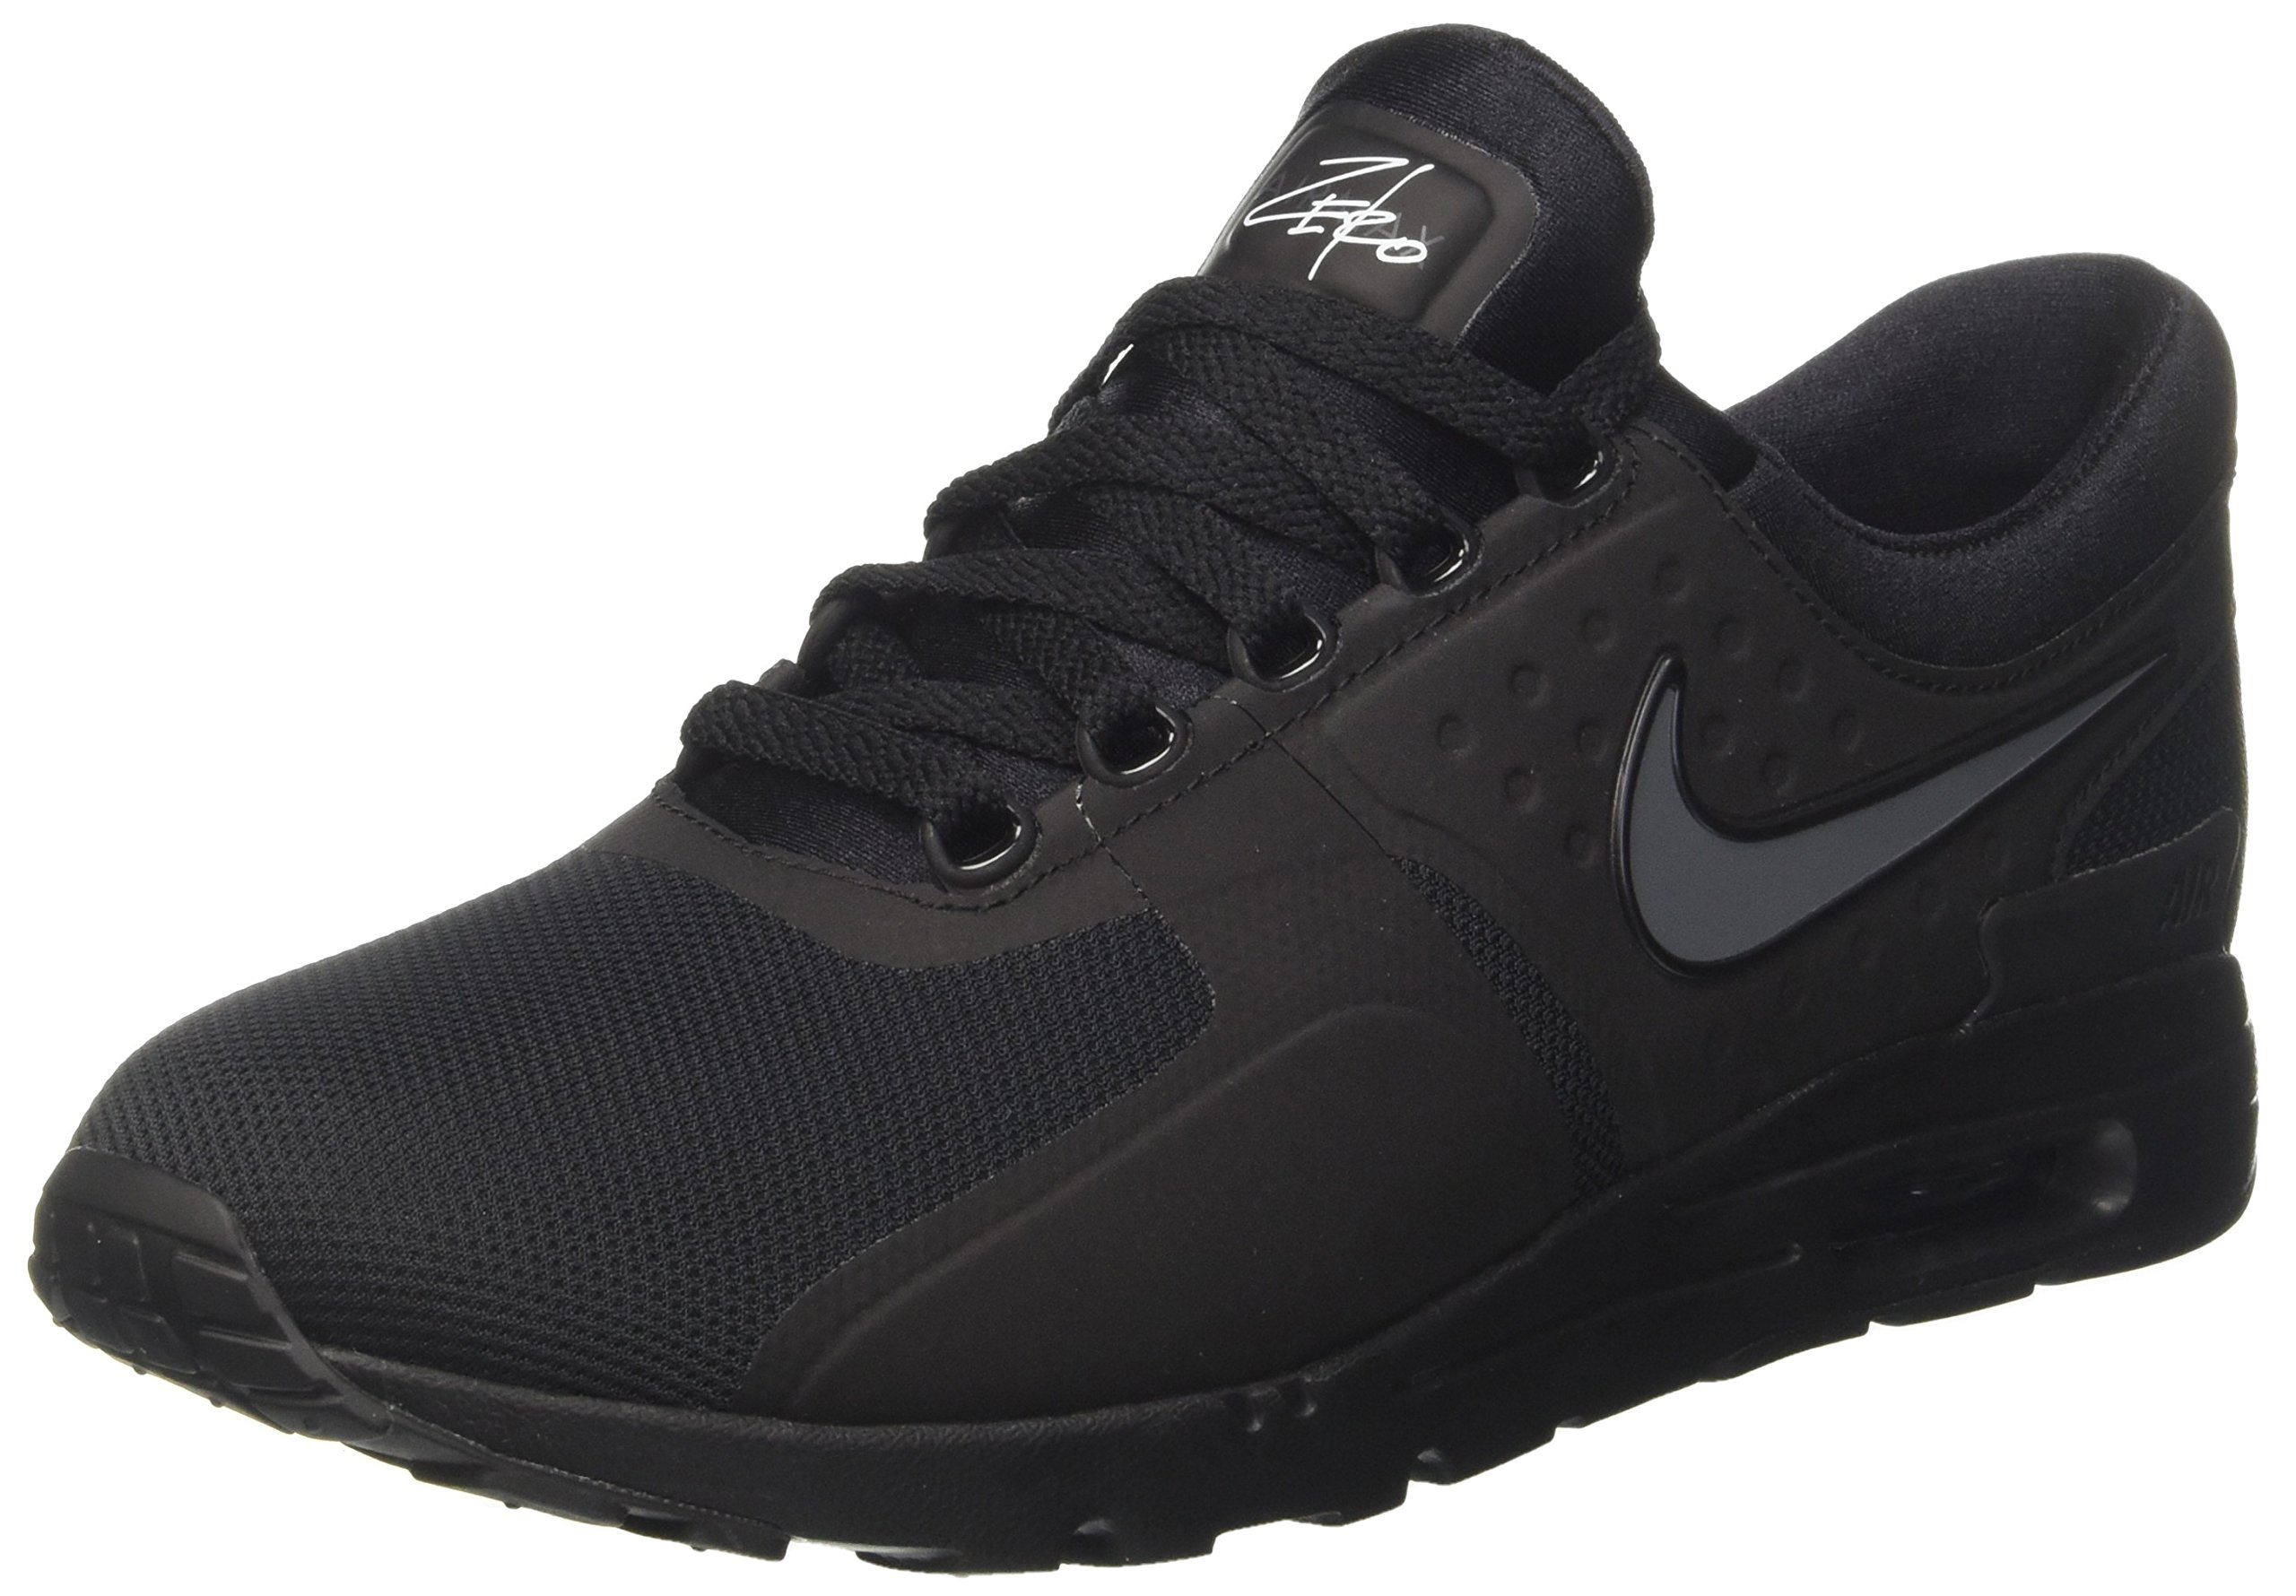 quality design b11cd 9bcb3 Galleon - NIKE Women s Air Max Zero Black Black Dark Grey White Running Shoe  10 Women US